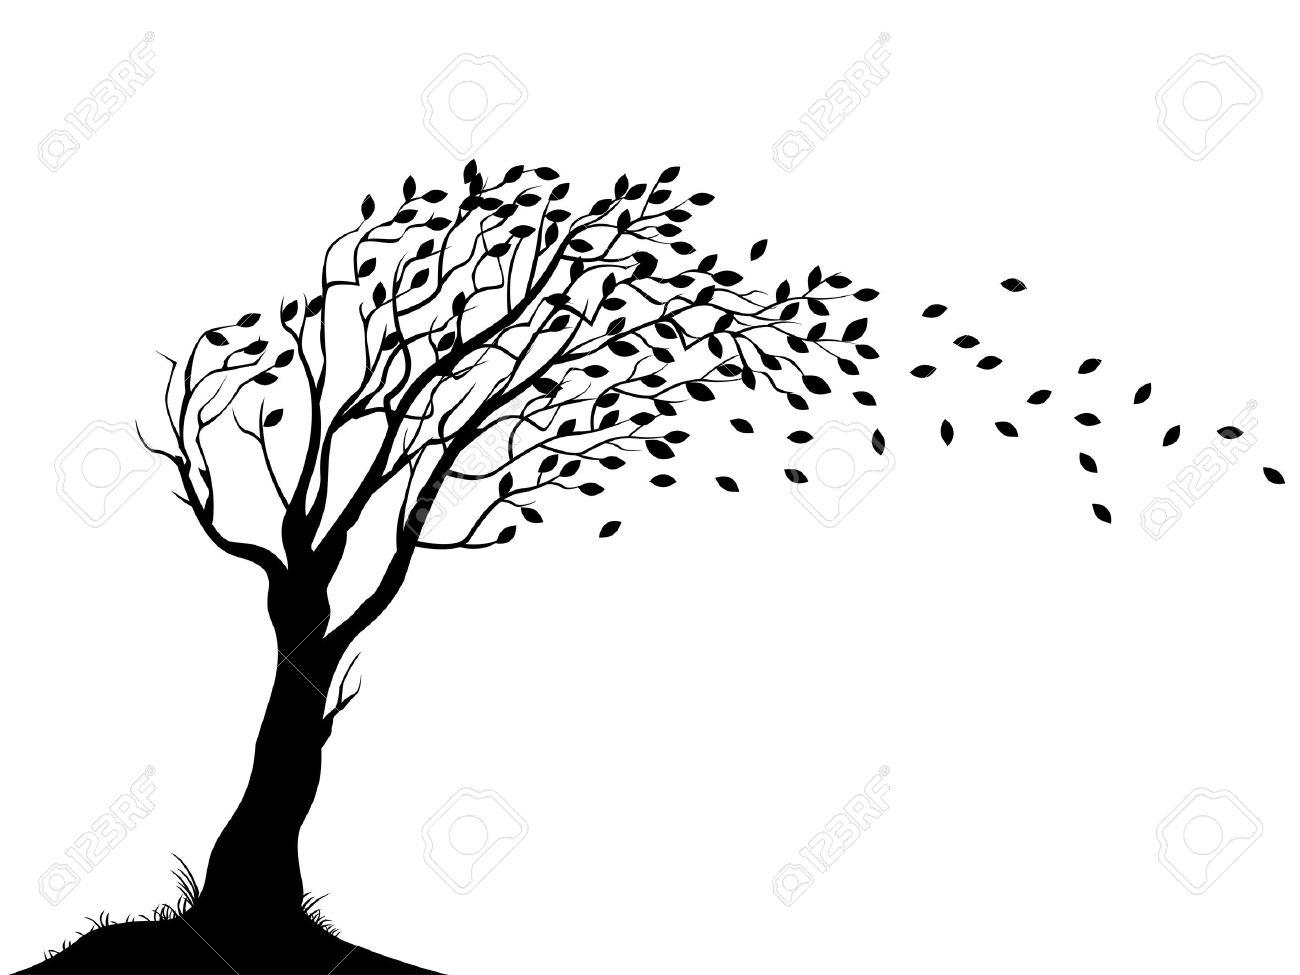 Autumn tree silhouette vector - Polyvore